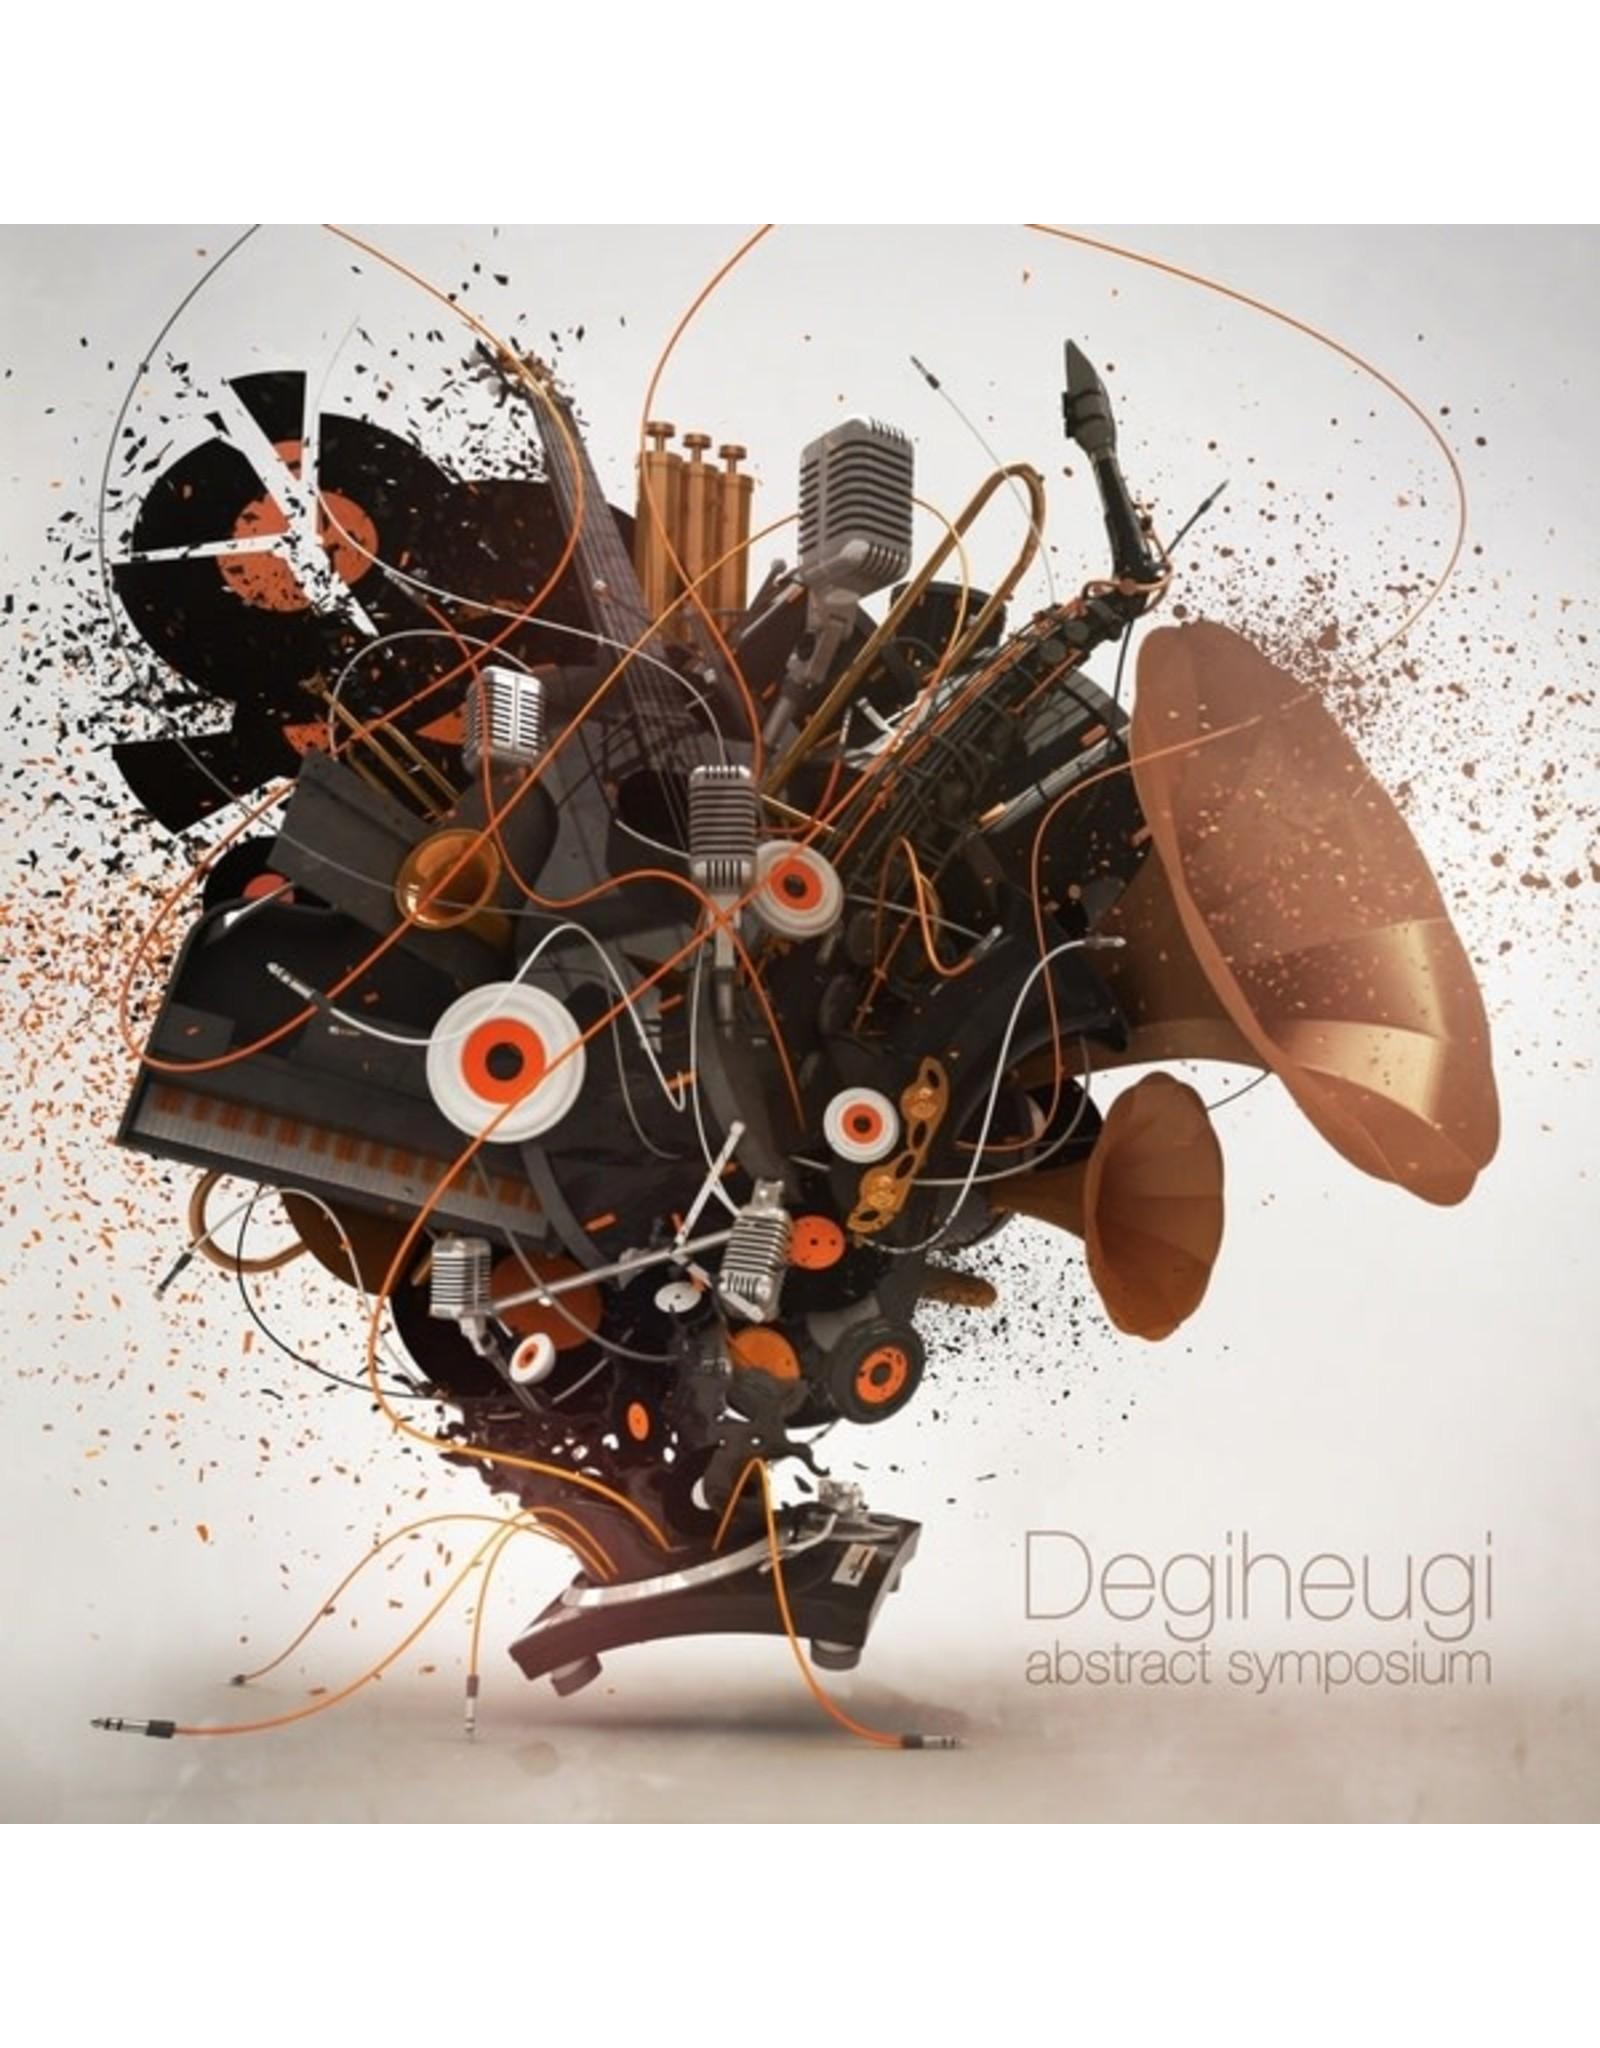 New Vinyl Degiheugi - Abstract Symposium 2LP